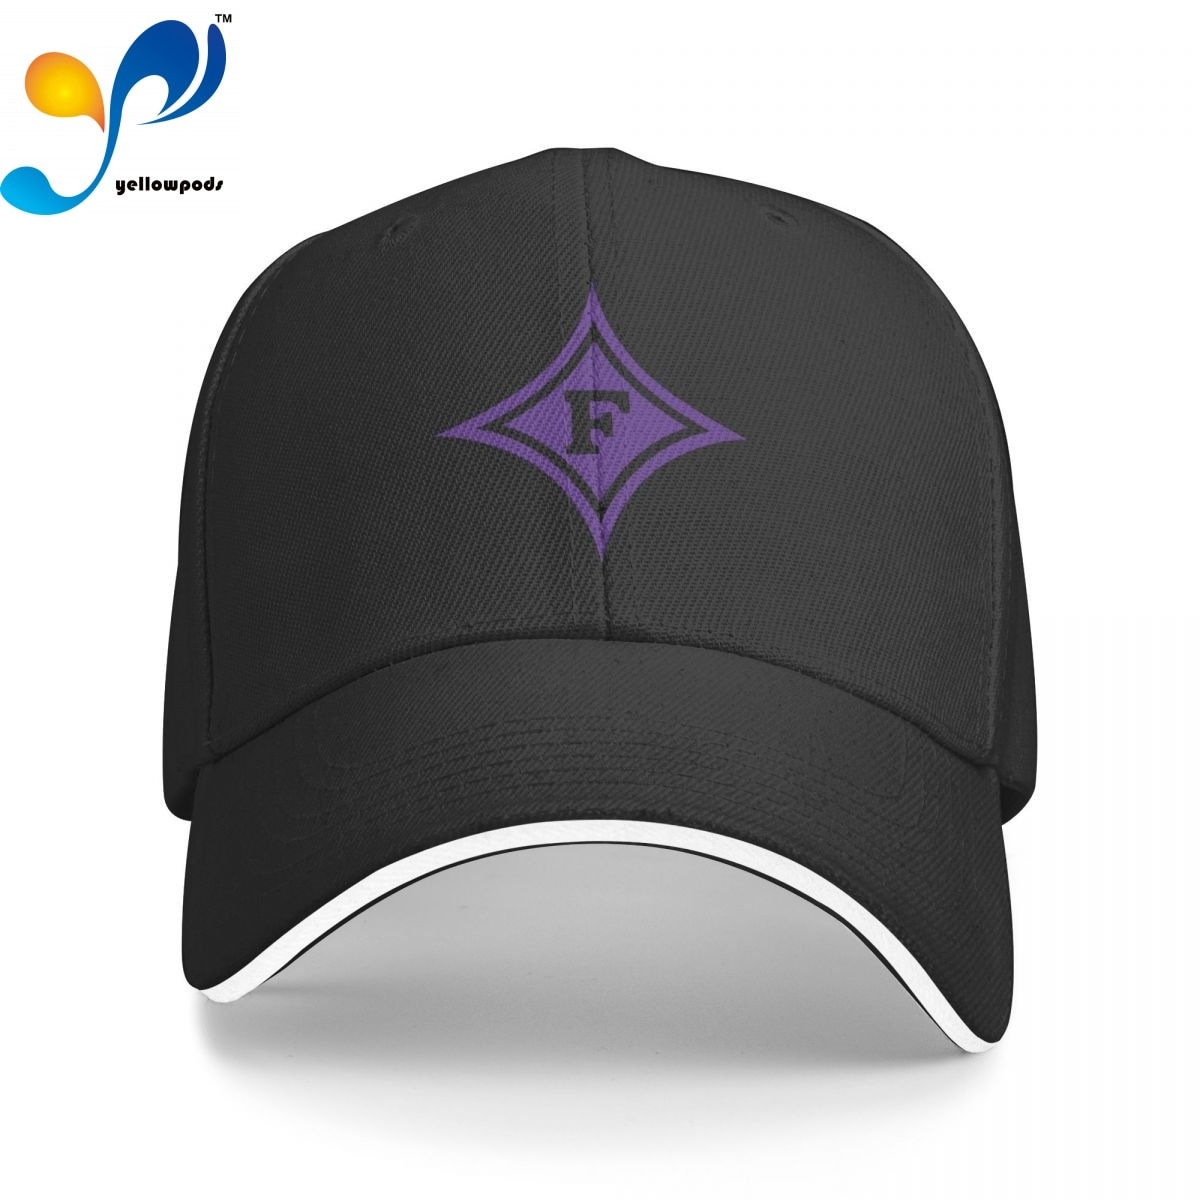 Фурман, Кепка-тракер, бейсболка для мужчин, бейсболка с клапаном, мужские шапки, кепки с логотипом